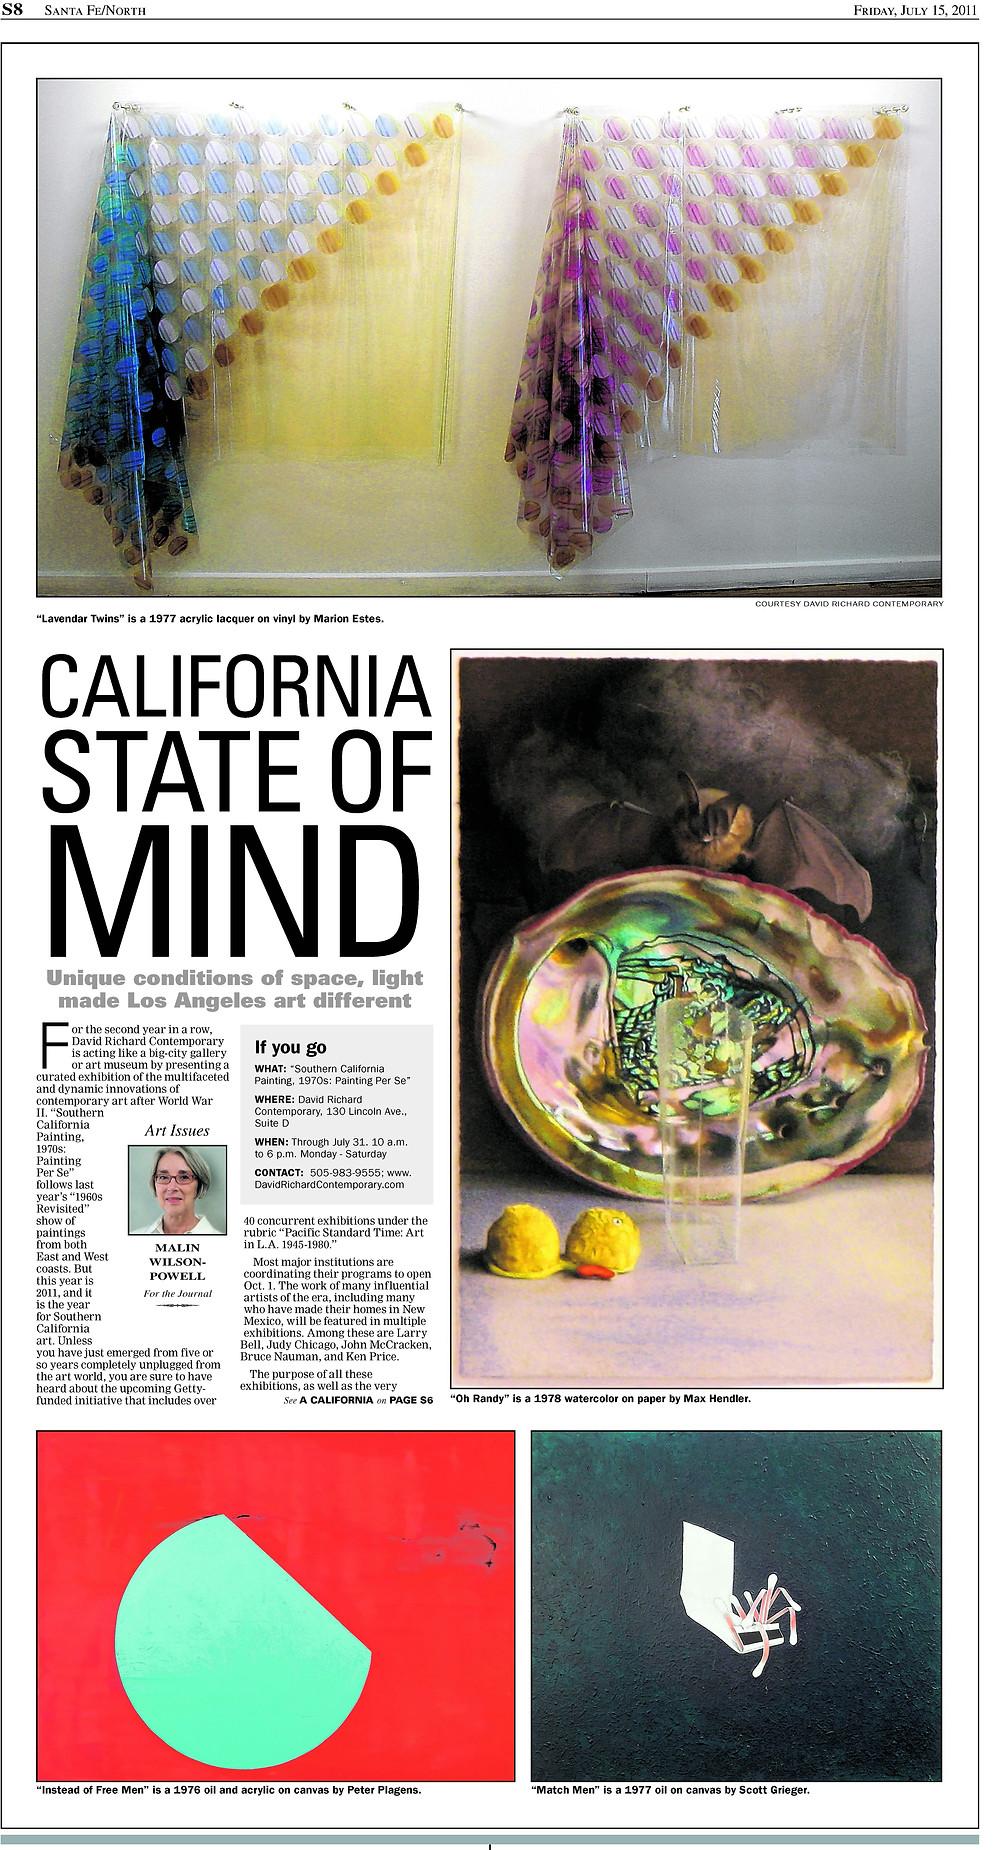 MaLin Wilson-Powell - Albuquerque Journal / Journal North, July 15, 2011